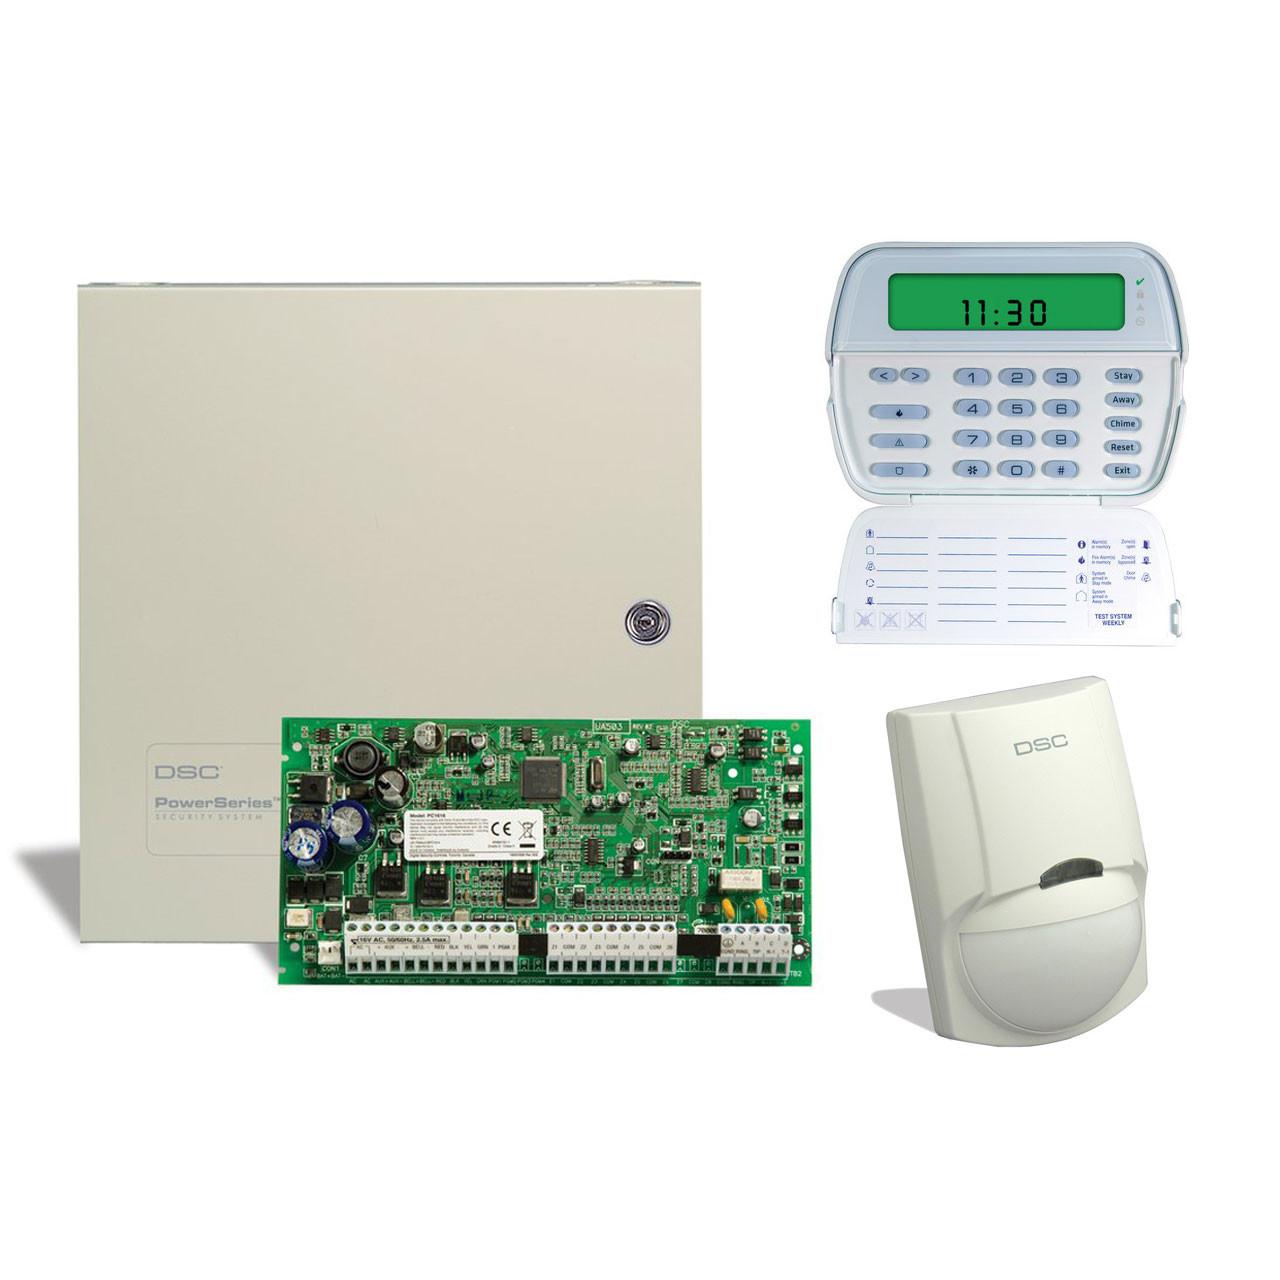 dsc 6 zone alarm kit with keypad and motion detector DSC 1616 Programming Manual PDF dsc programming manual 1616